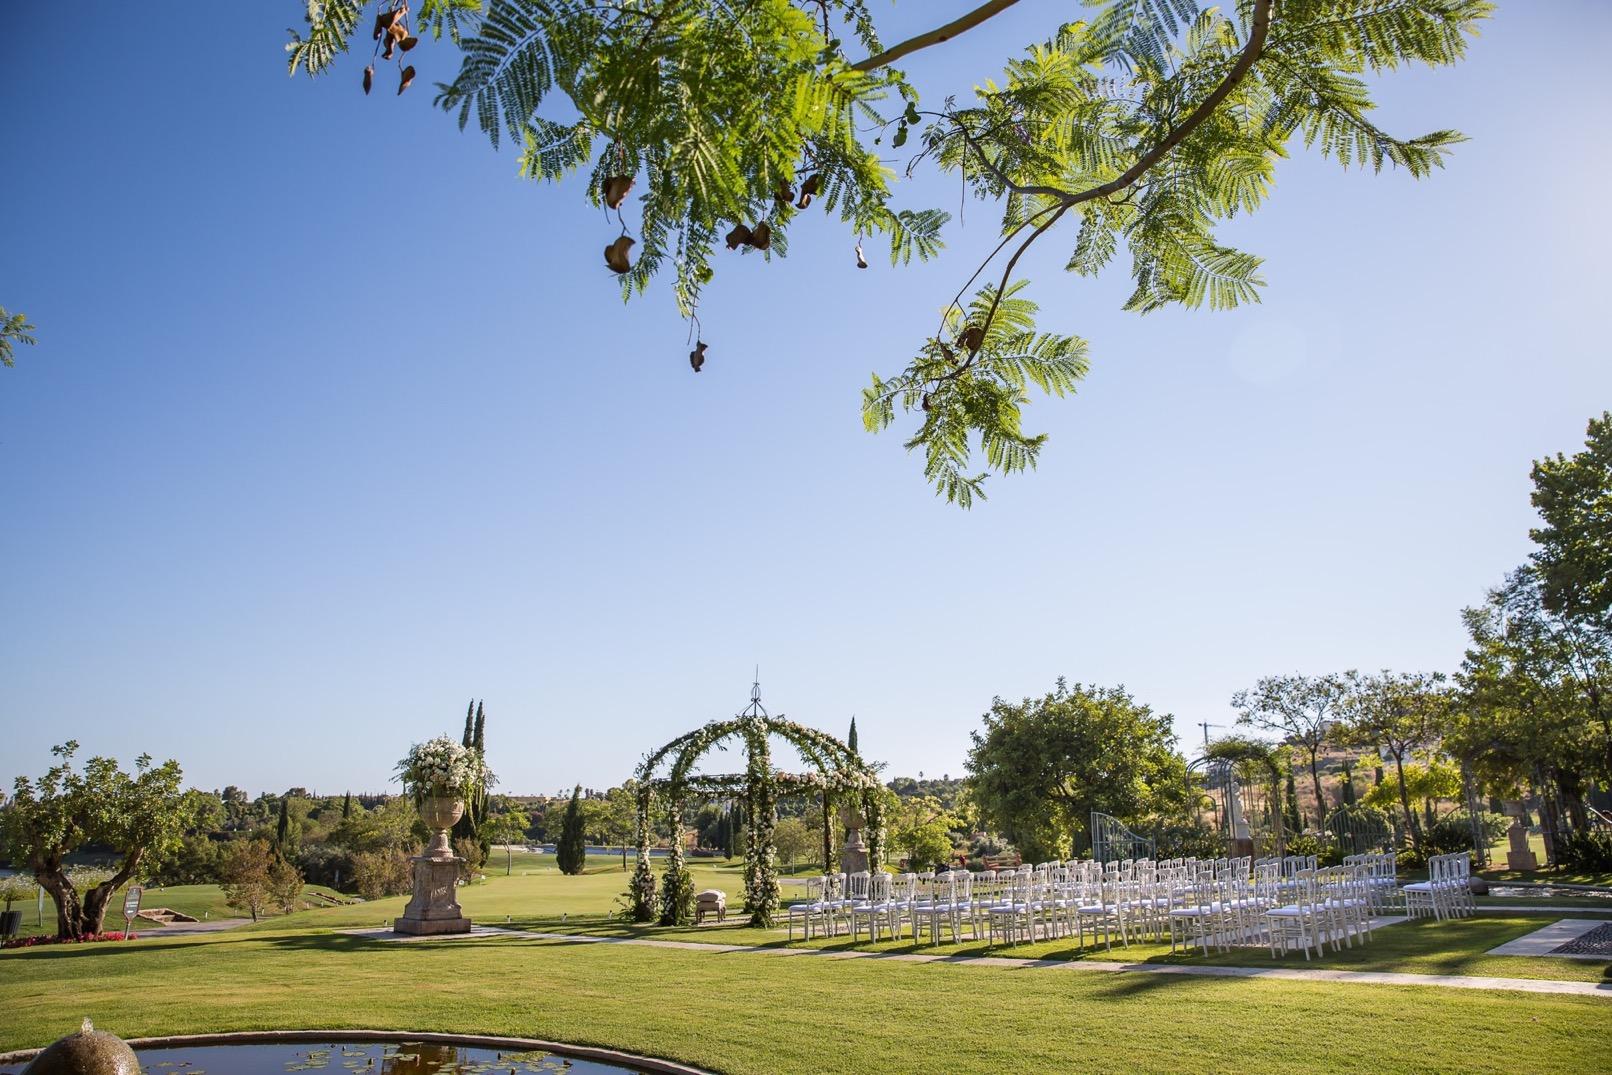 Si-Quiero-Wedding-Planner-By-Sira-Antequera-Bodas-Málaga-Marbella-Miami-001